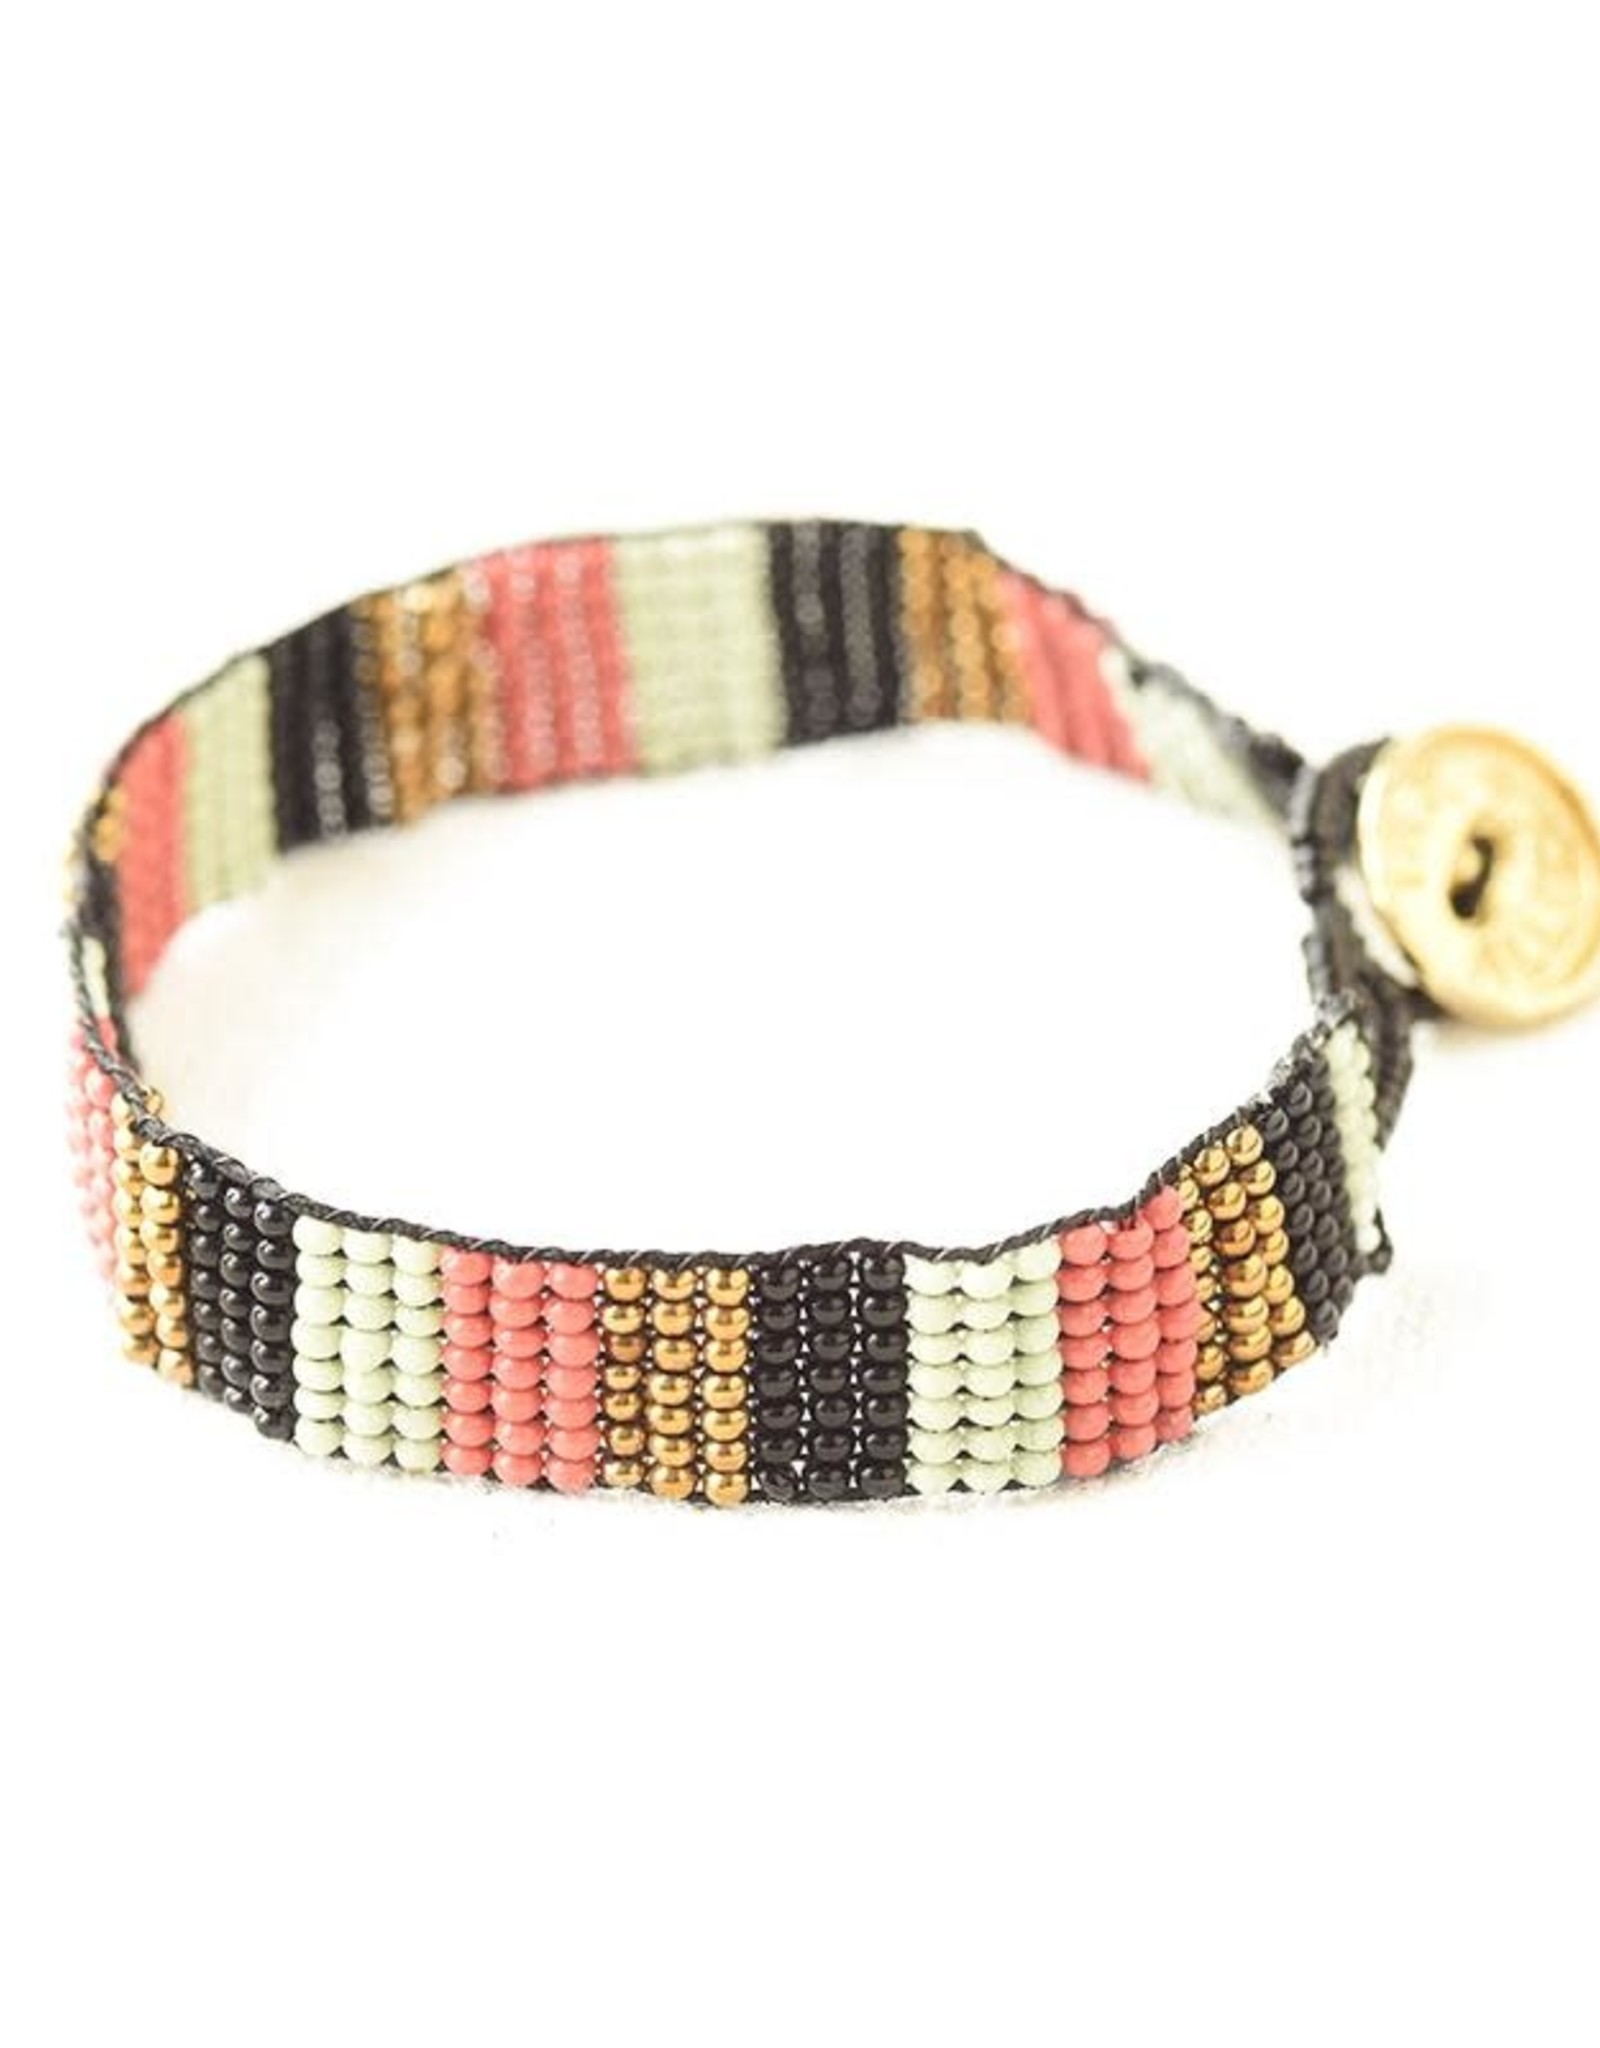 INK + ALLOY Mint Terra Cotta Gold Black Beaded Bracelet